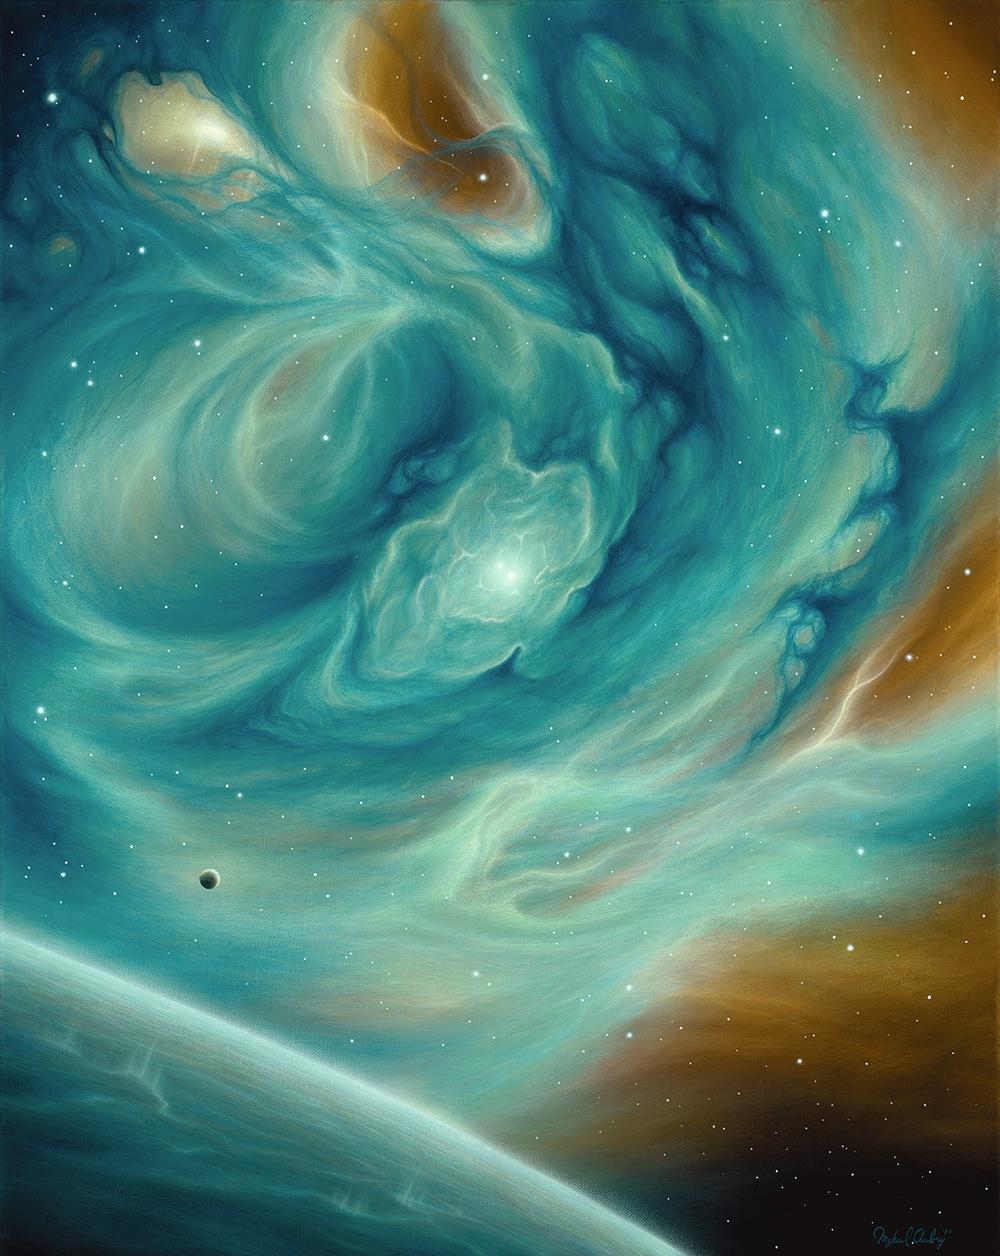 Orbital Resonance, 24x30, Acrylic on Canvas